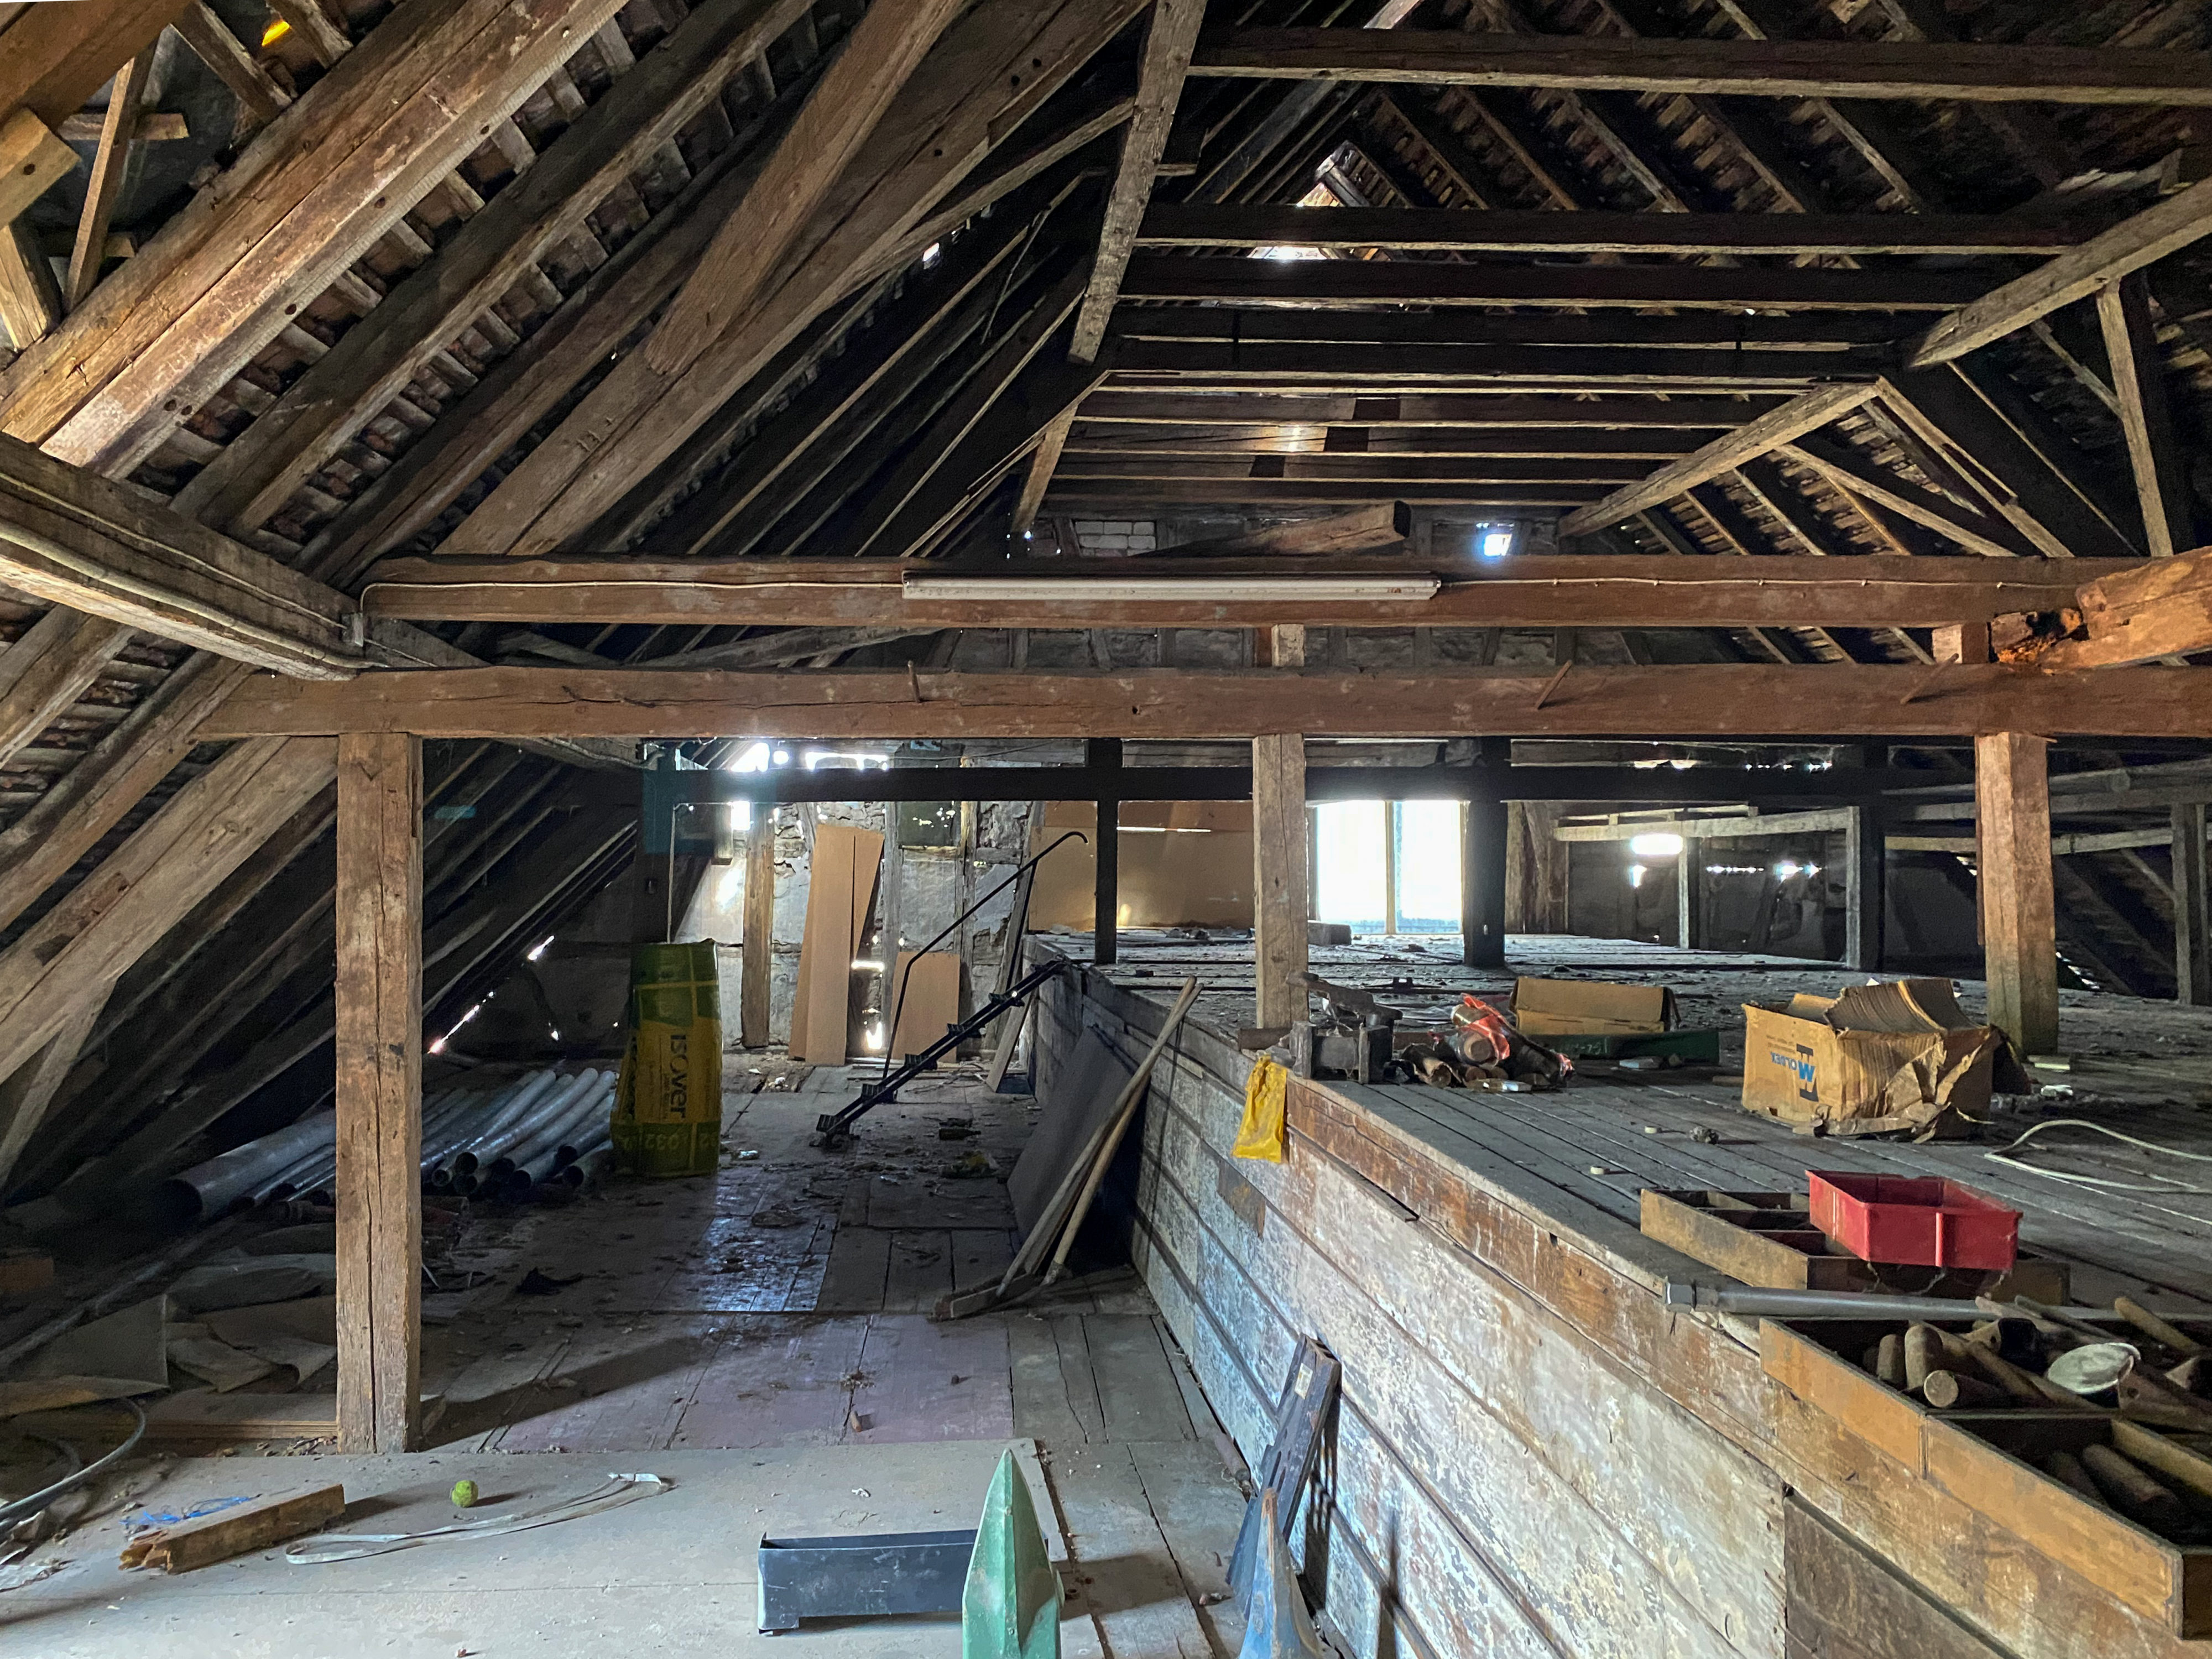 Dachgeschoss vom Alten Stutenstall in Weil